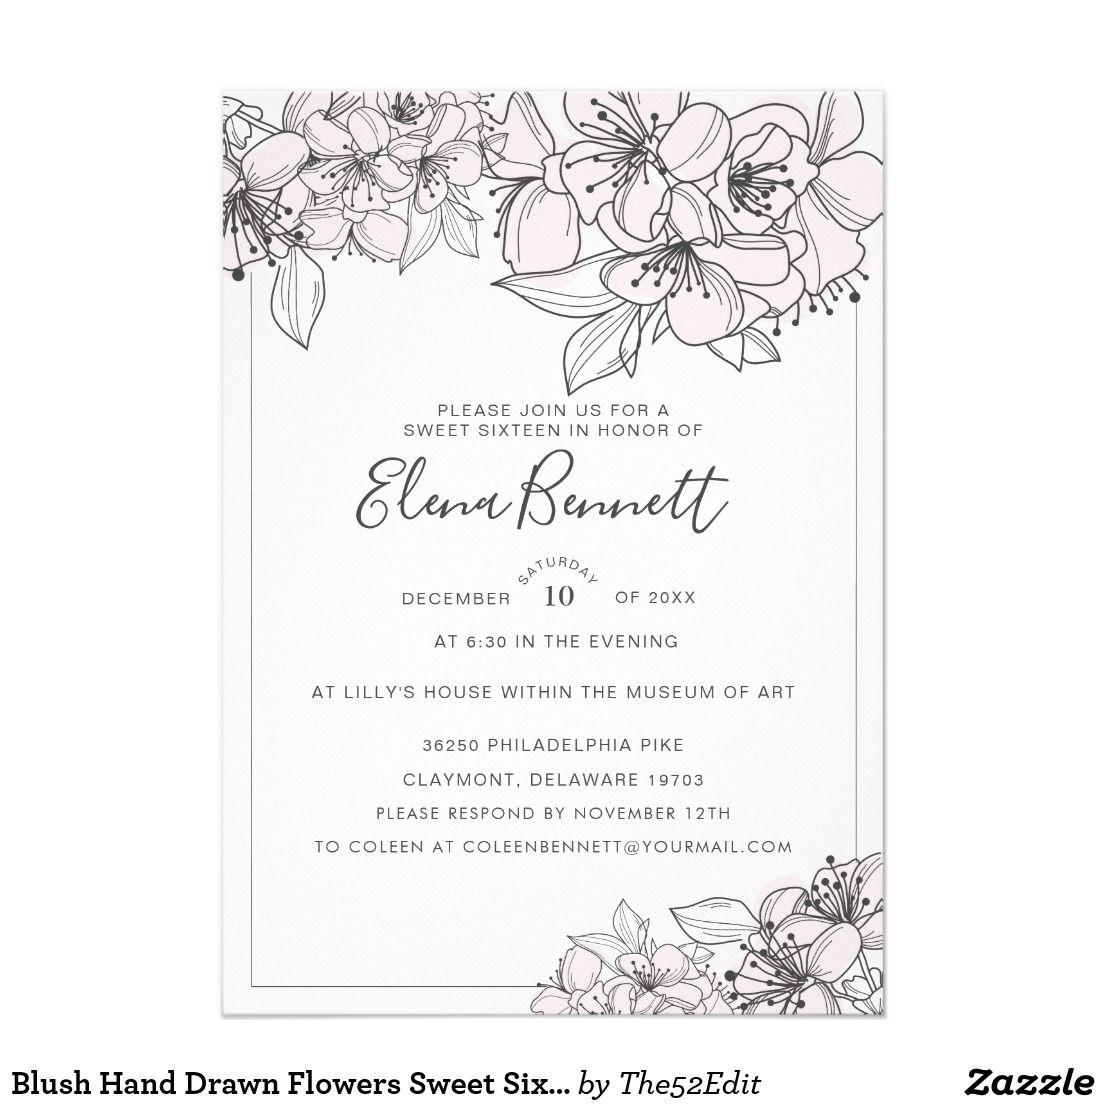 Blush Hand Drawn Flowers Sweet Six Invitation Zazzle